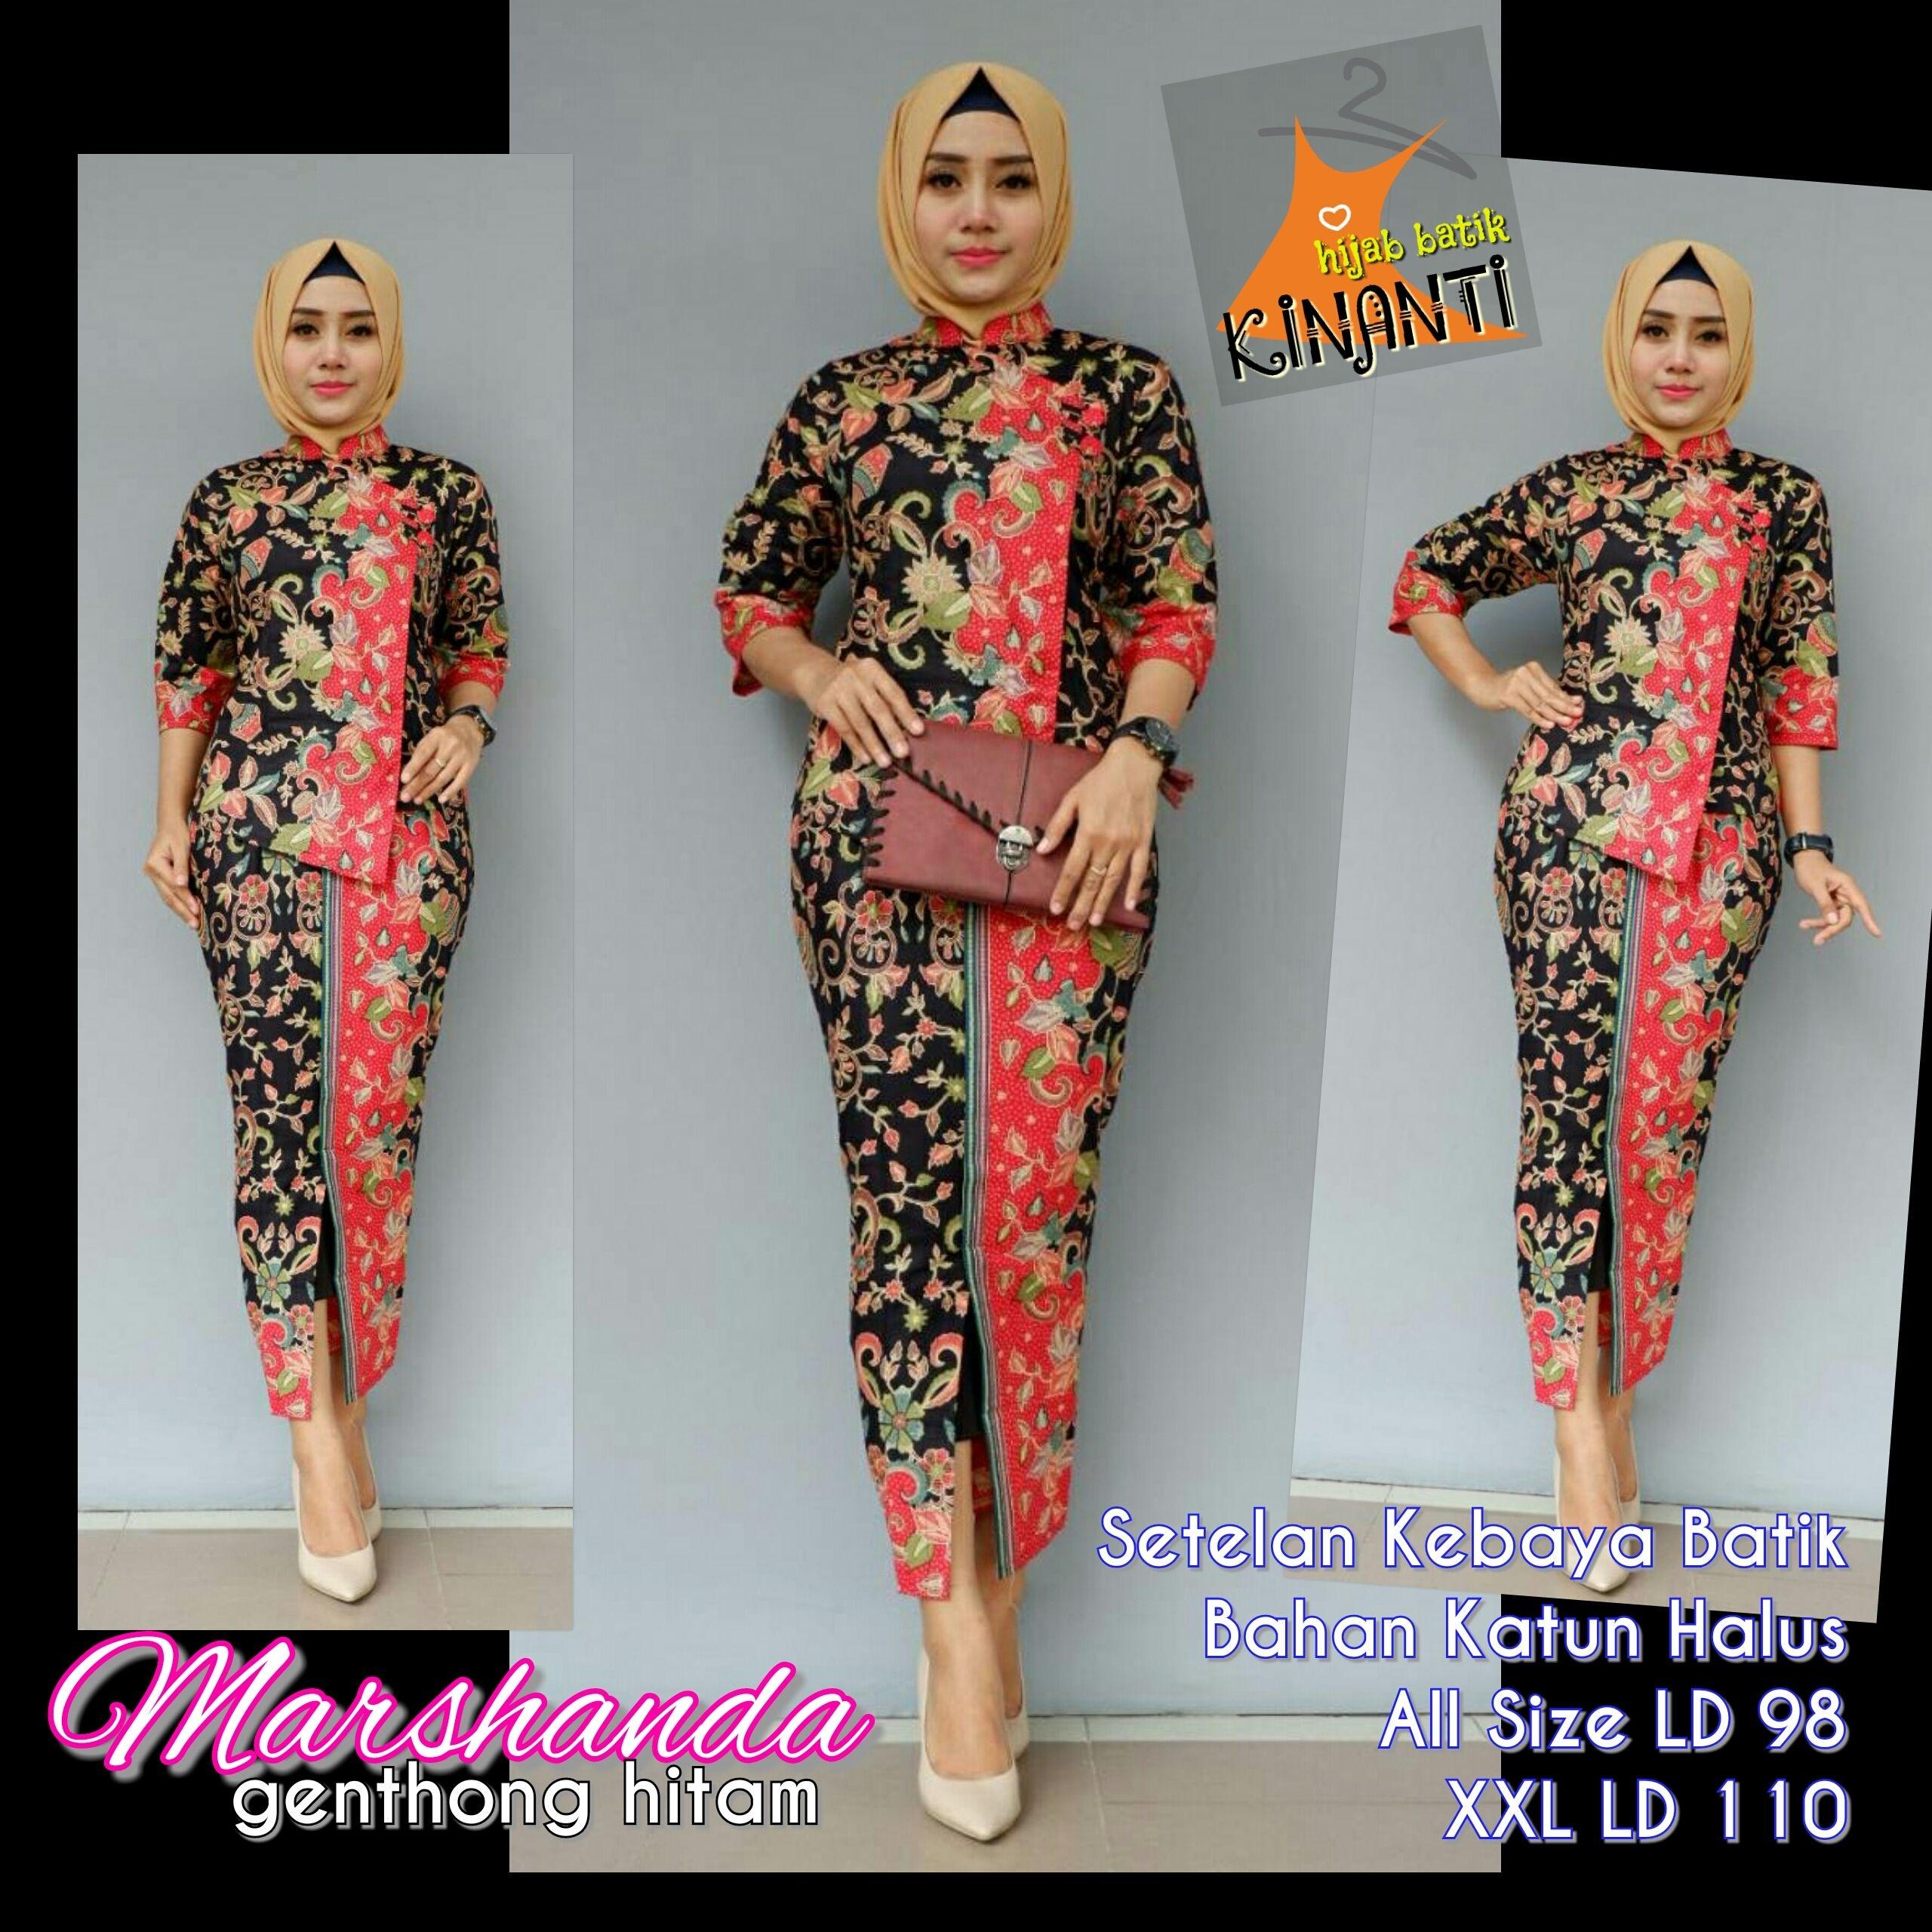 Model Hijab Kebaya - langkung.com